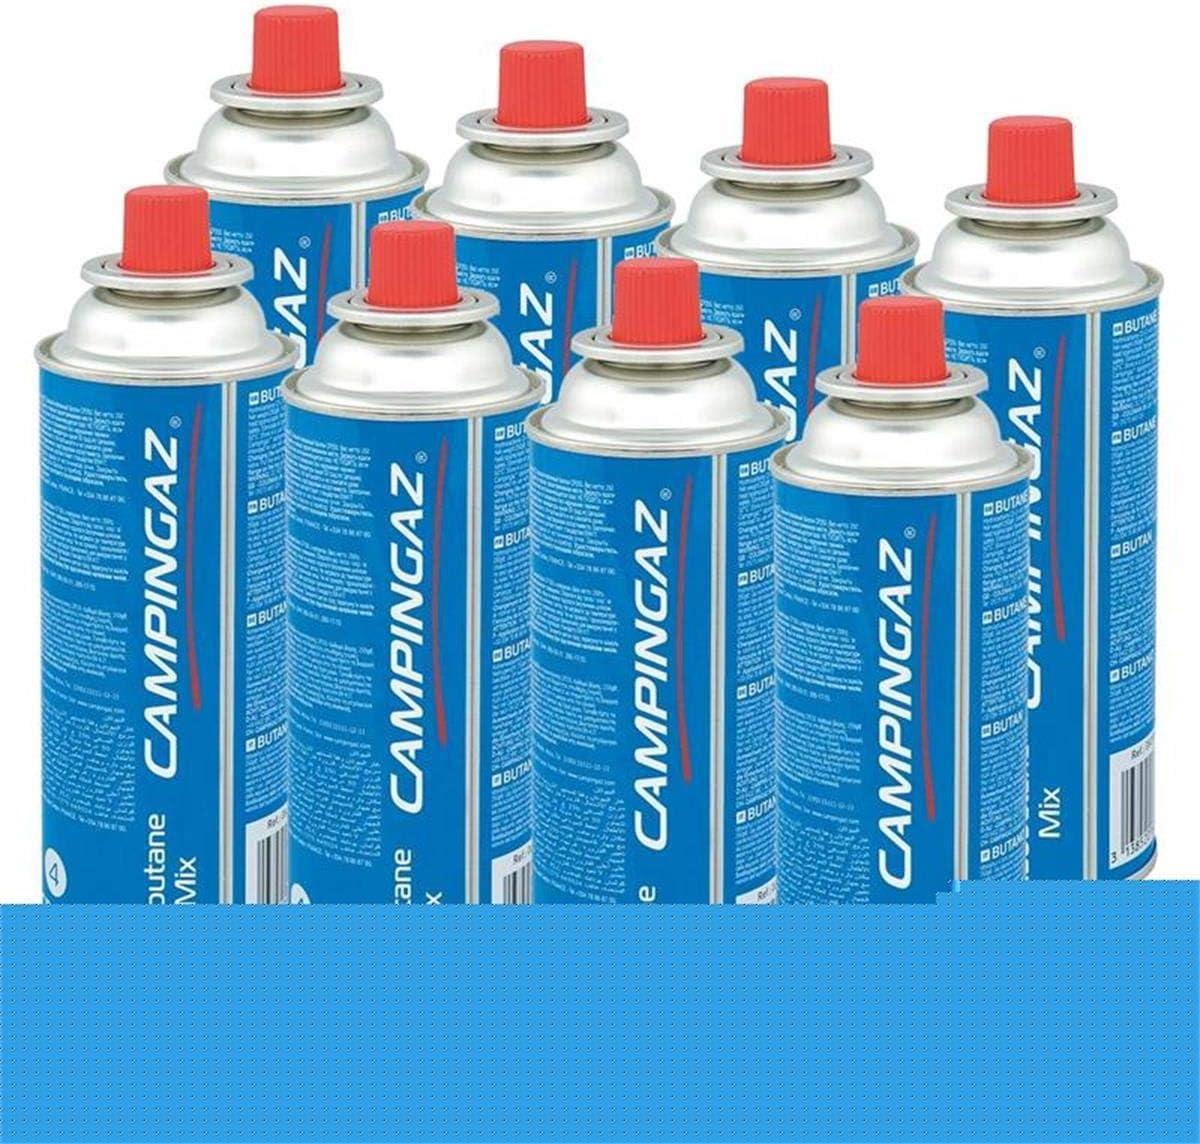 8 X Campingaz CP250 Resealable Bistro Gas Cartridge - 250g by Campingaz